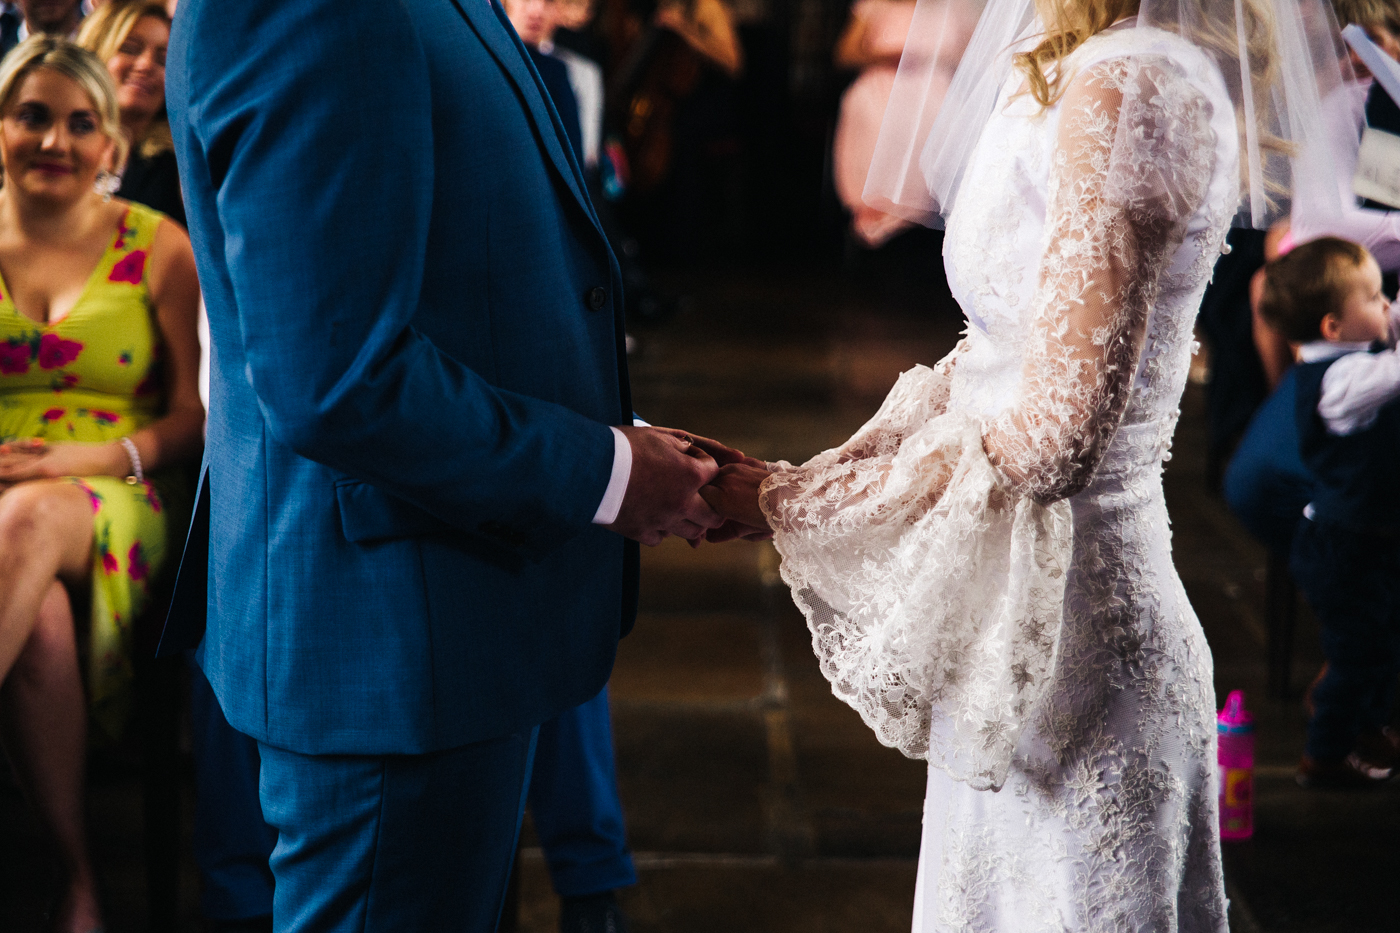 teesside-middlesbrough-north-east-wedding-photographer-creative-wedding-venues-0015.jpg